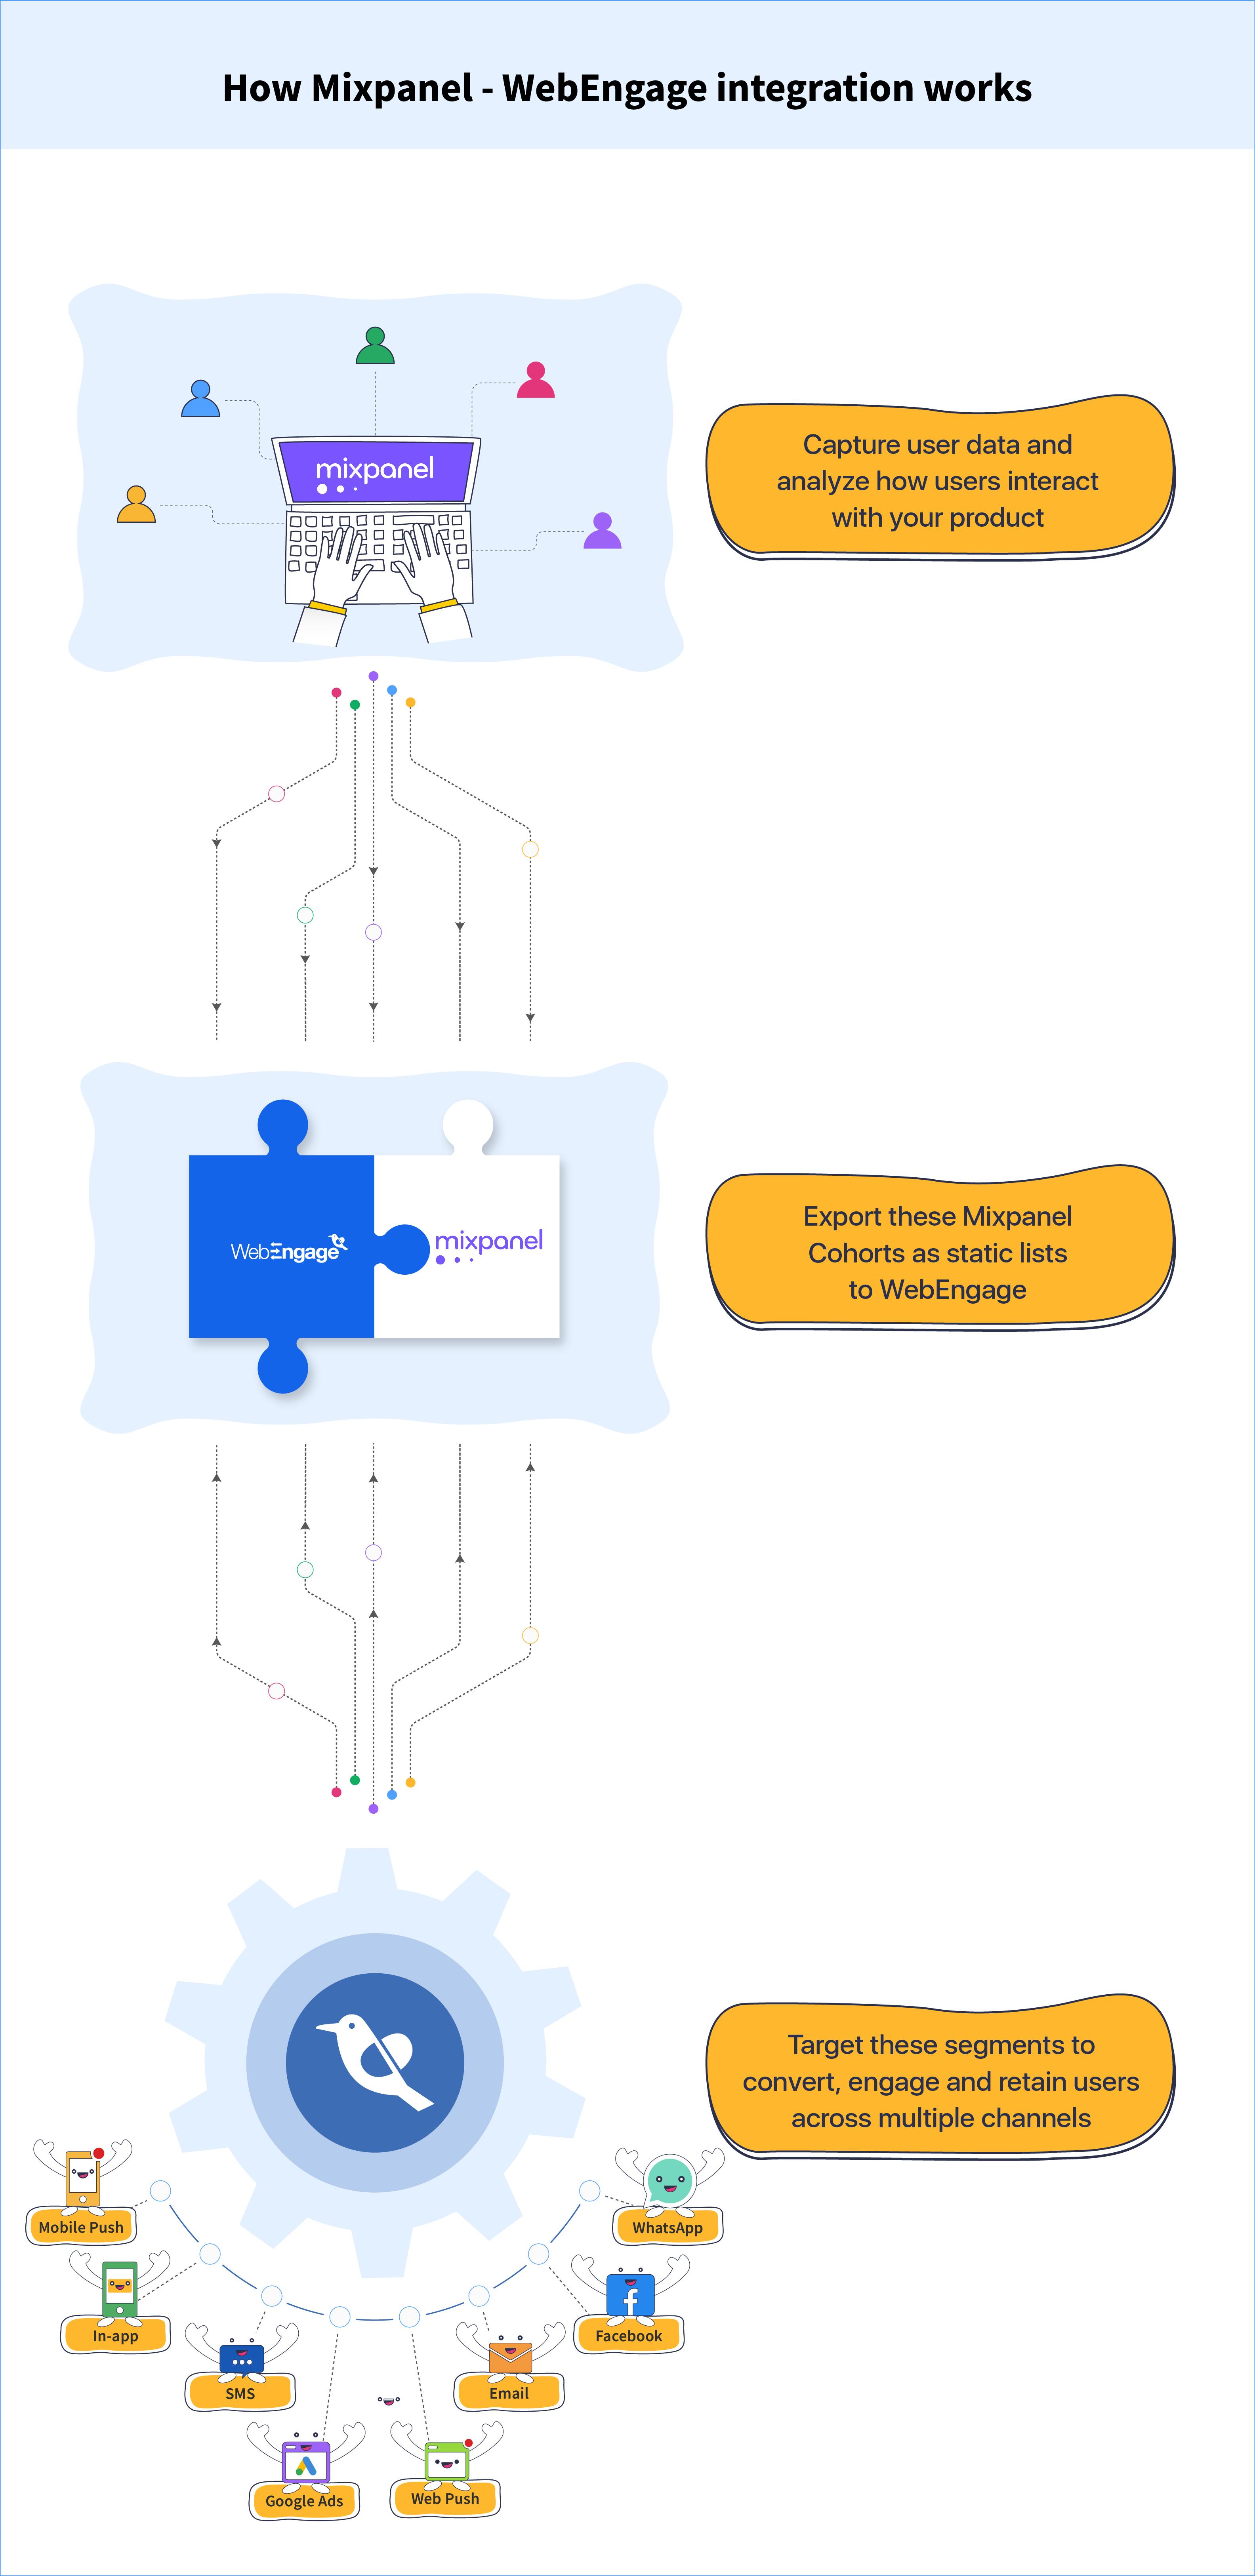 How Mixpanel - WebEngage integration works